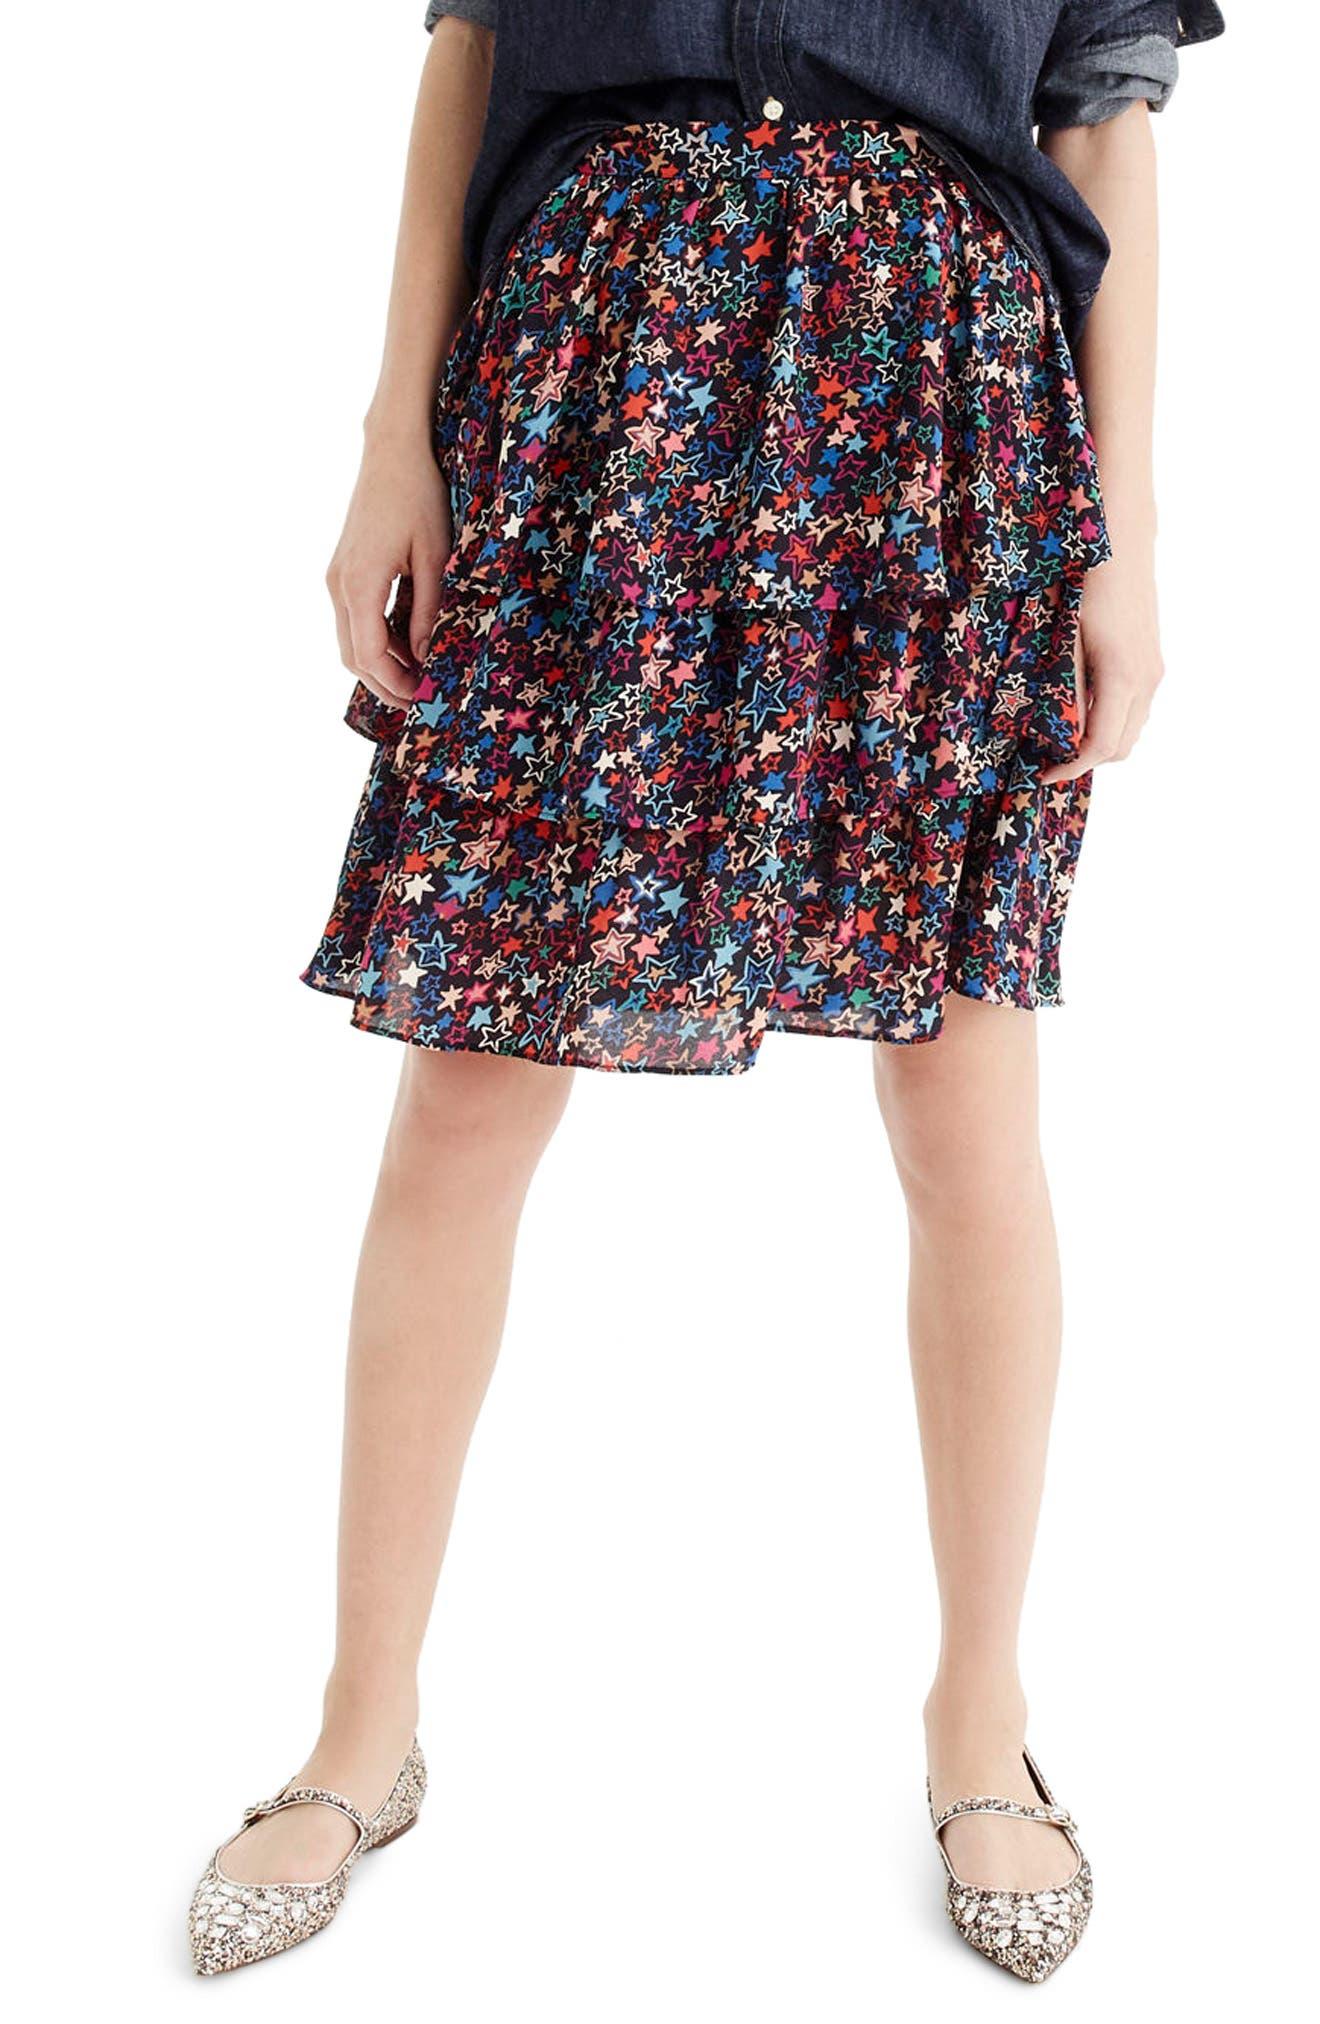 J.Crew Star Print Tiered Skirt